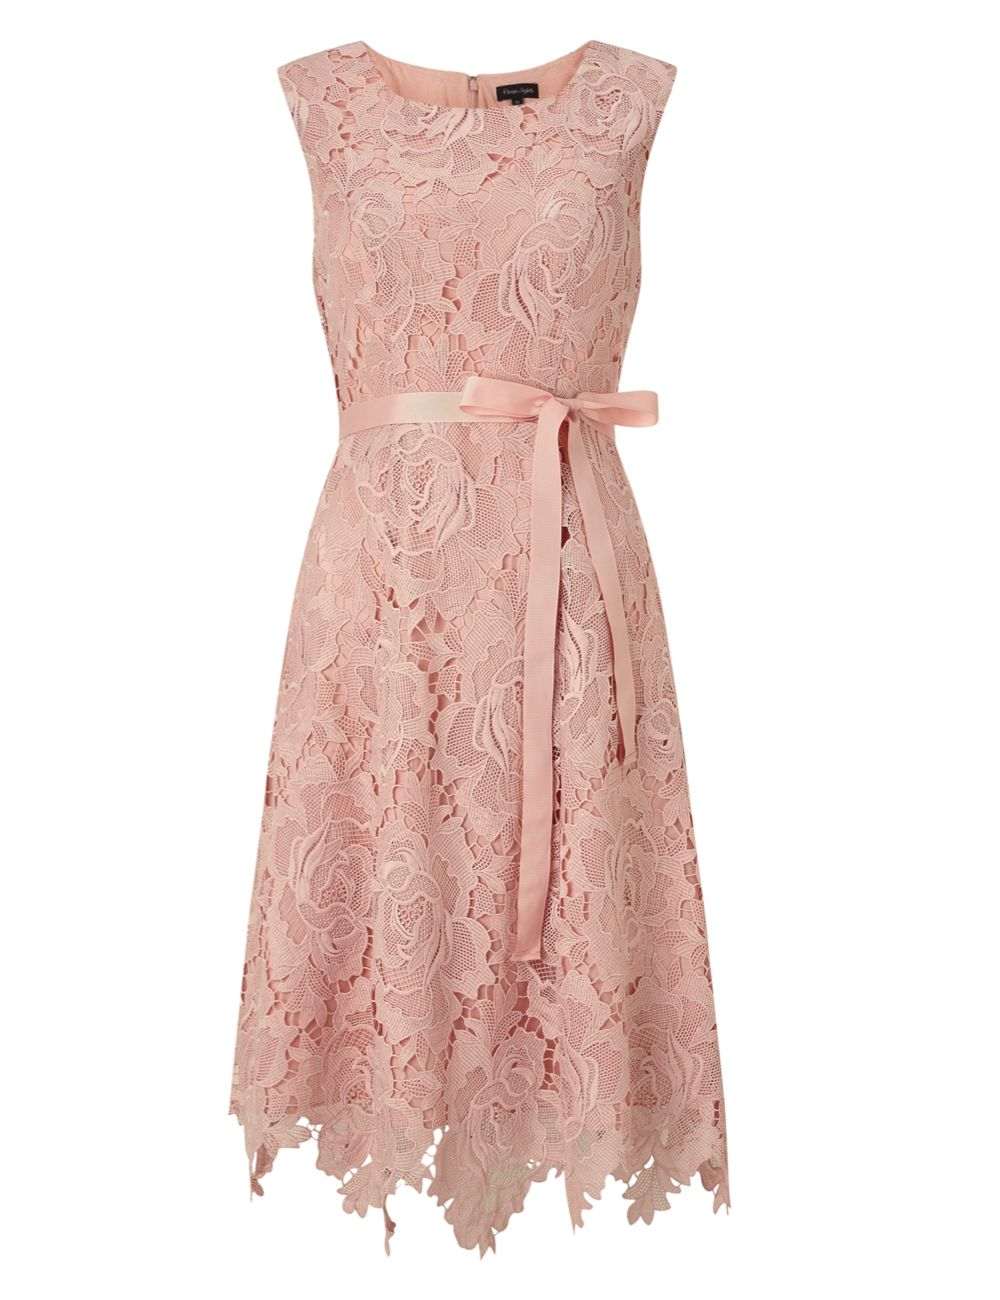 Fabulous High Street Bridesmaid Dresses | Vestiditos, Vestido modelo ...